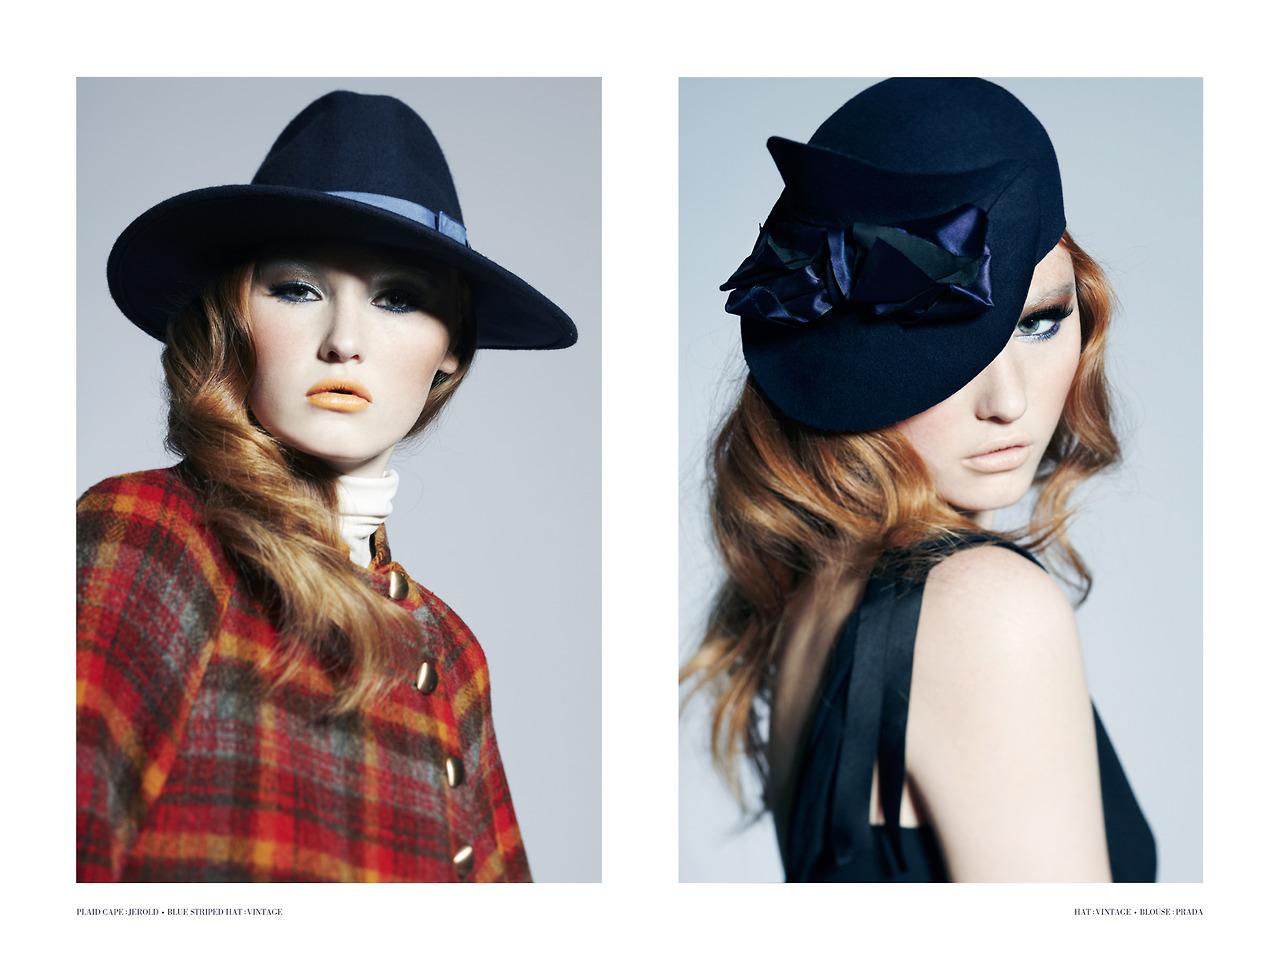 Dallas Hernandez @ Women Direct Styling // Katie Keim Hair and Makeup // Tanya De Jesus Photography // Chris Miggels © 2013